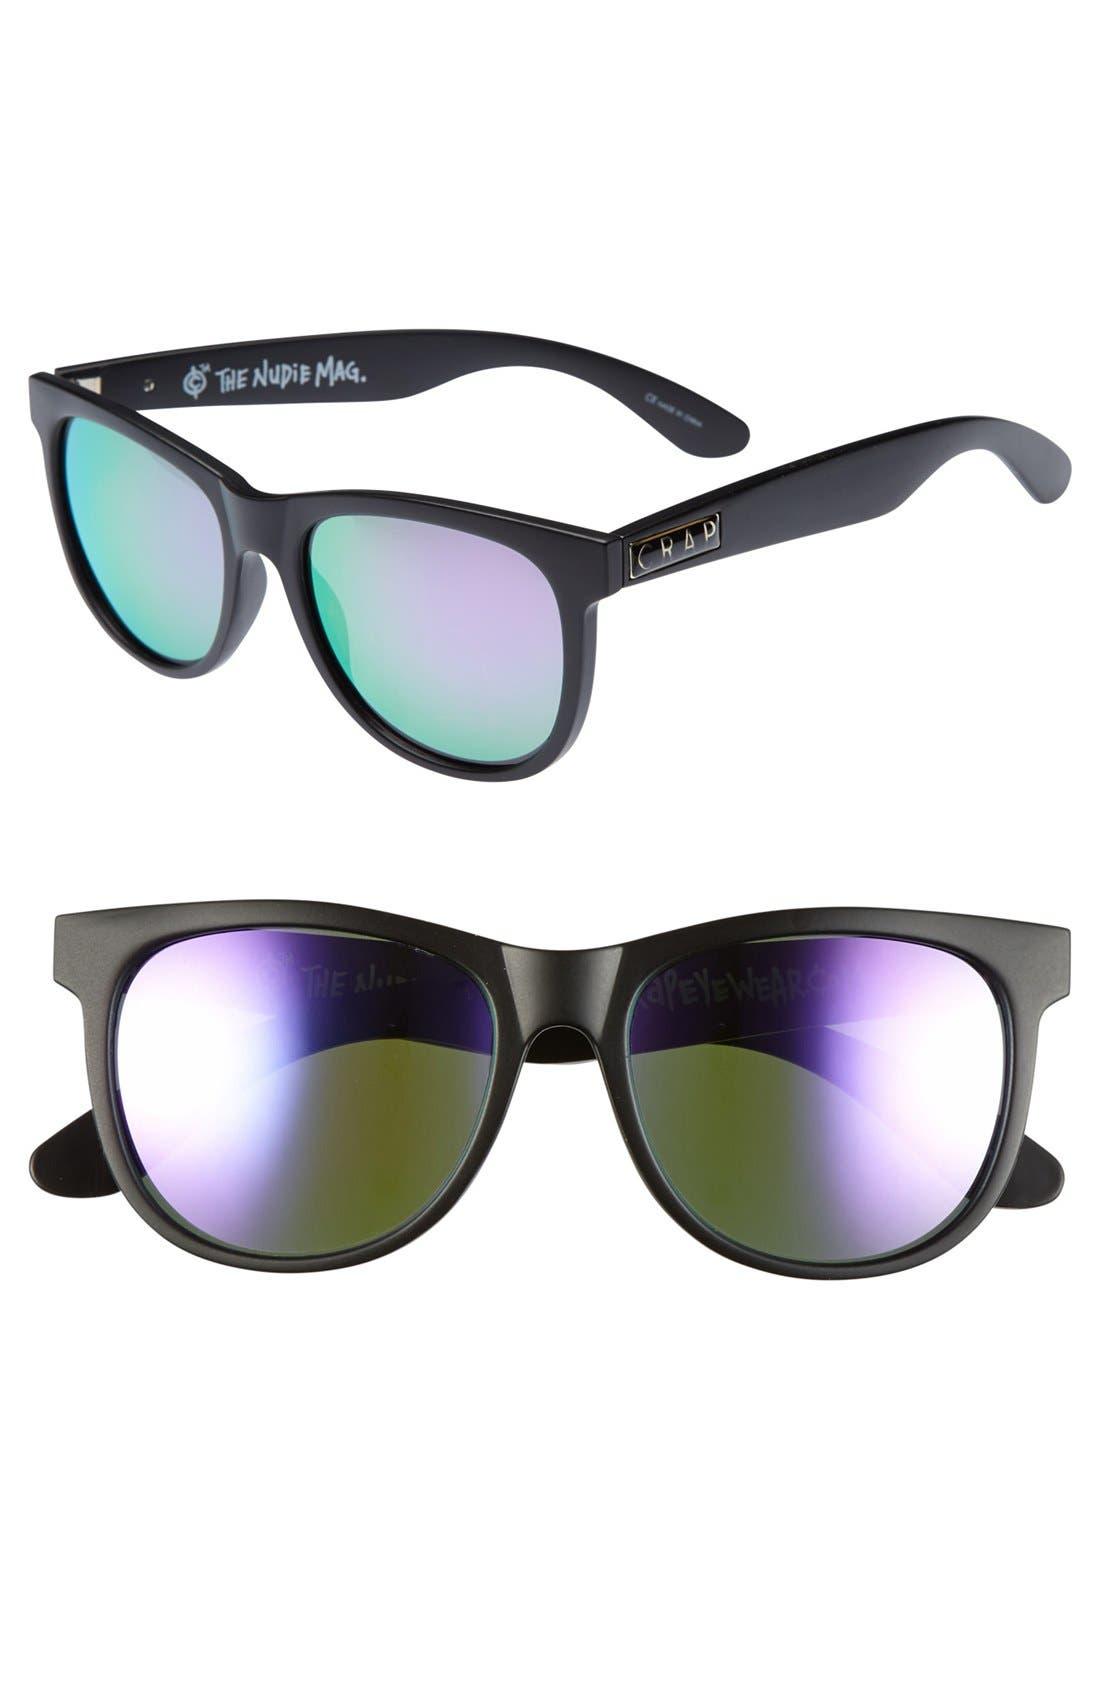 Main Image - CRAP Eyewear 'Nudie Mag' 55mm Sunglasses